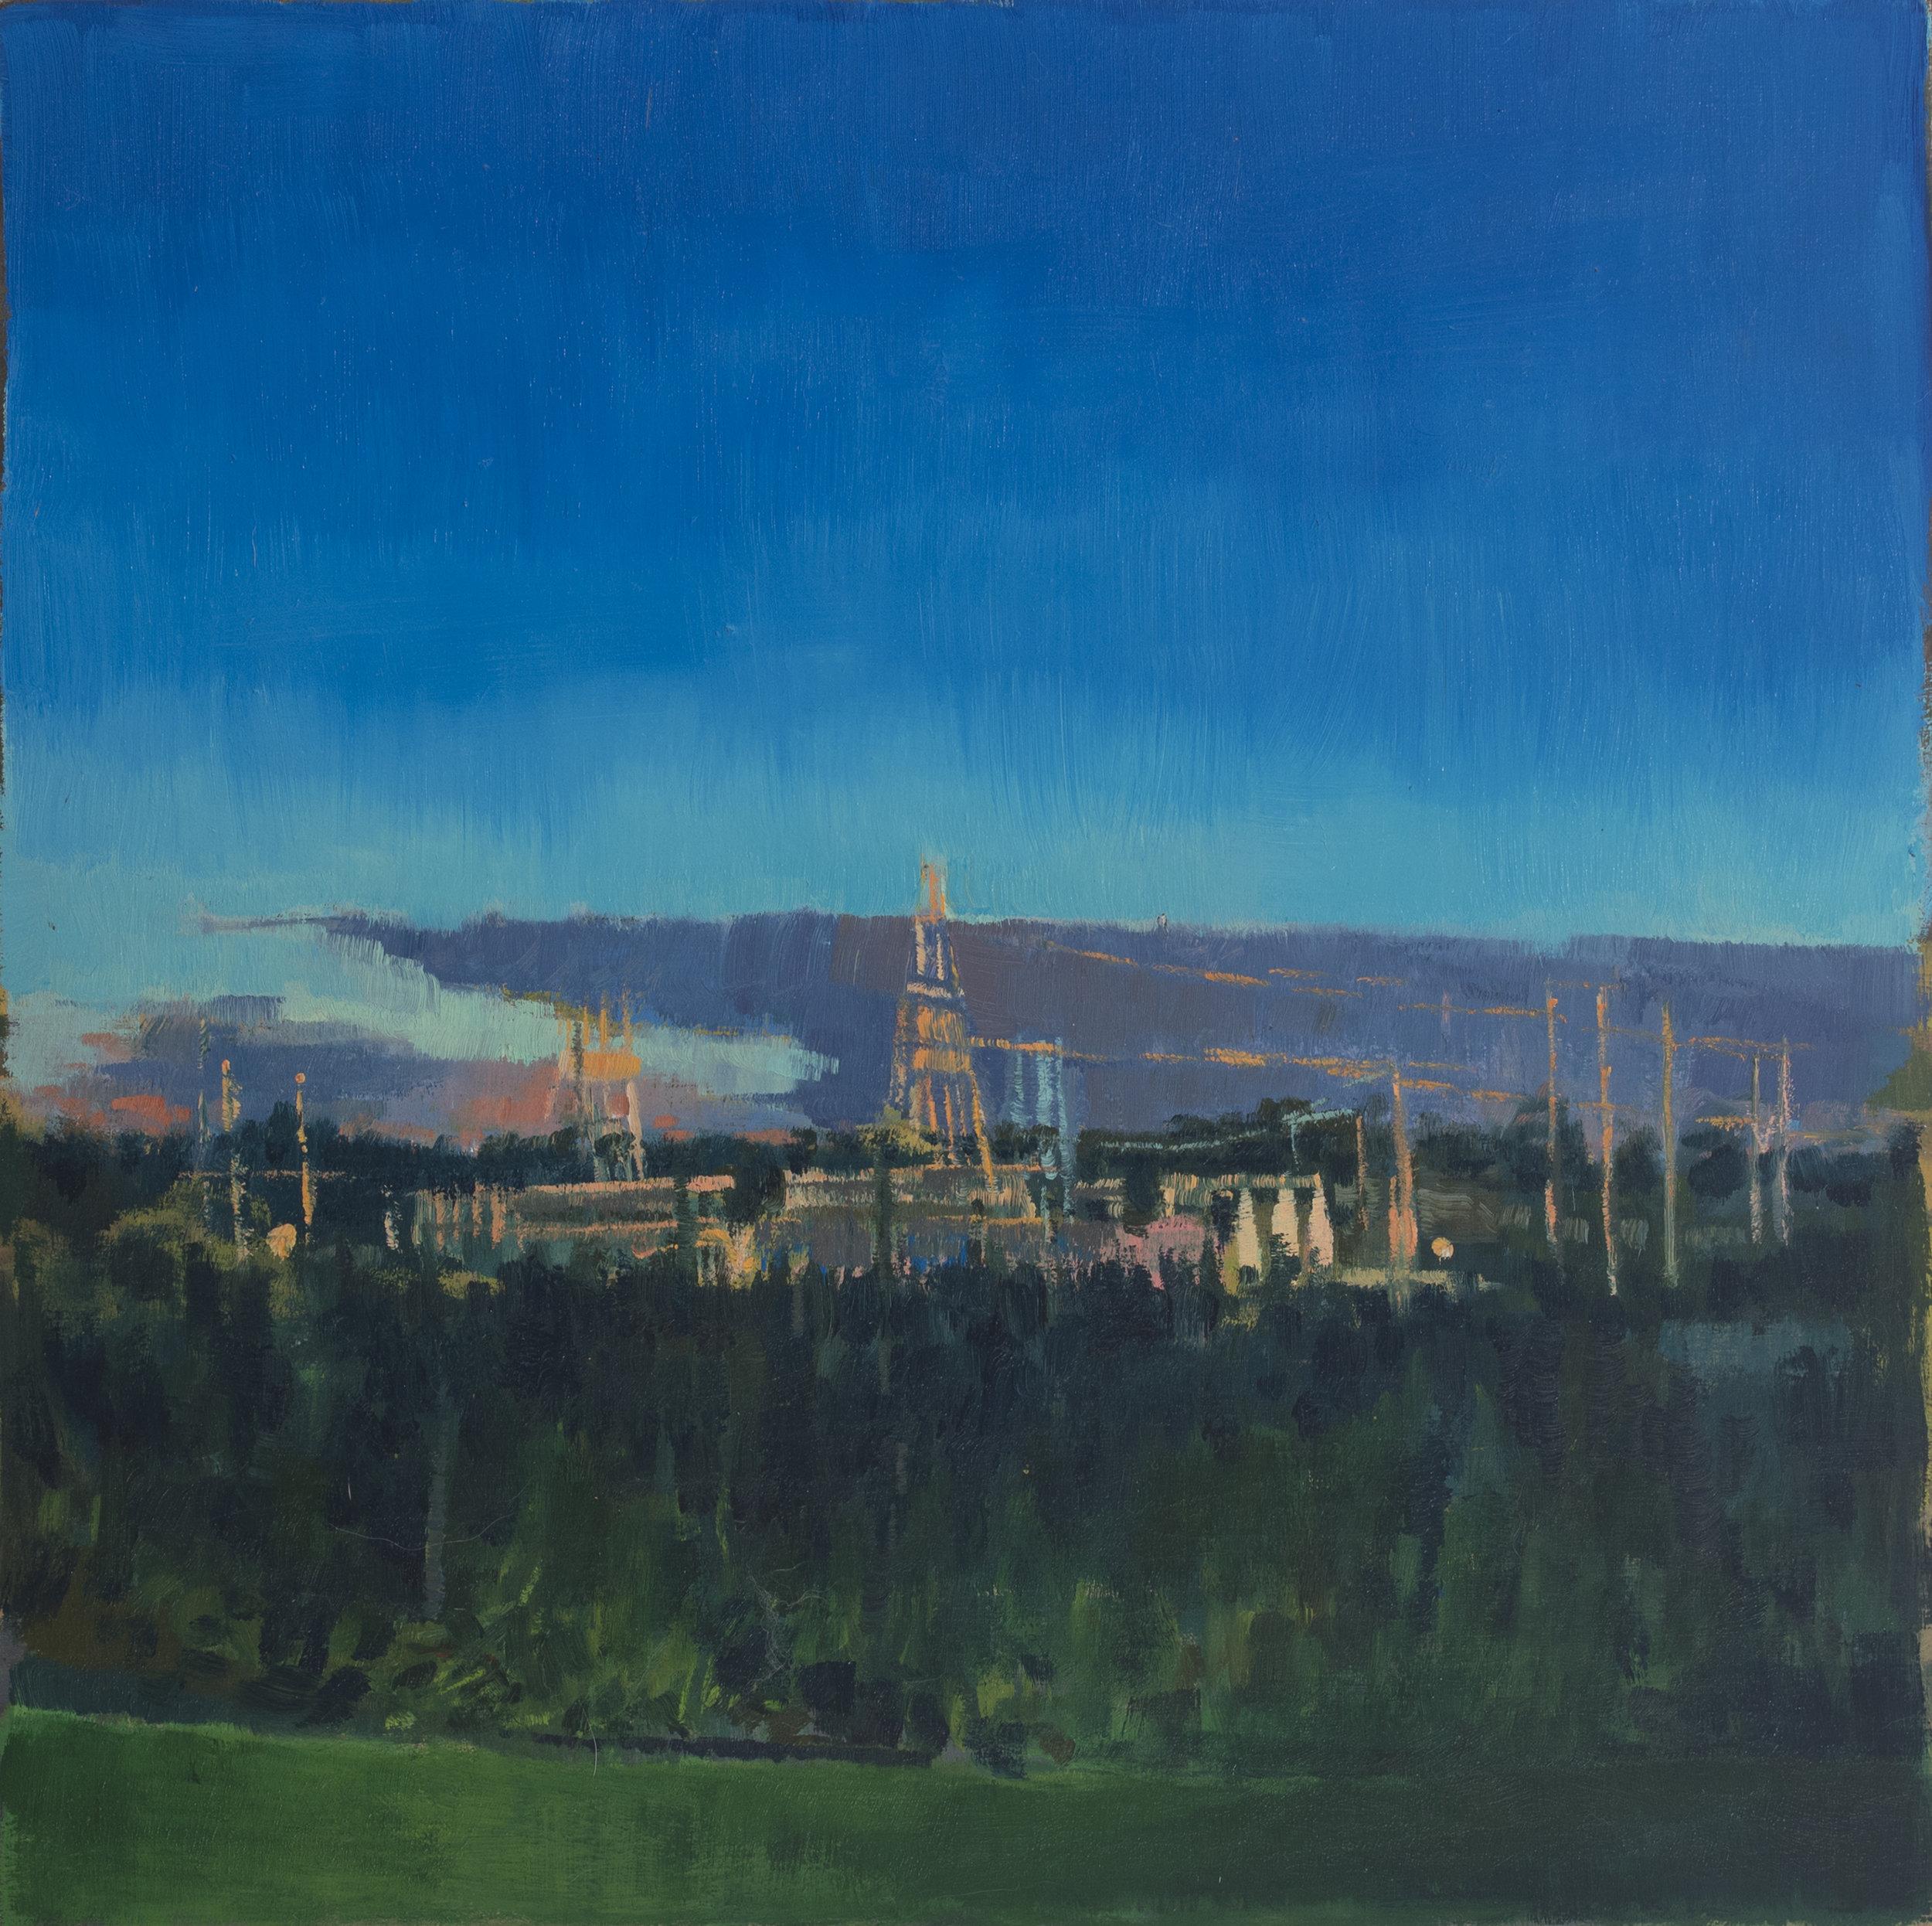 "Early Summer Twilight, Oil on Panel, 10"" x 10"", 2018"